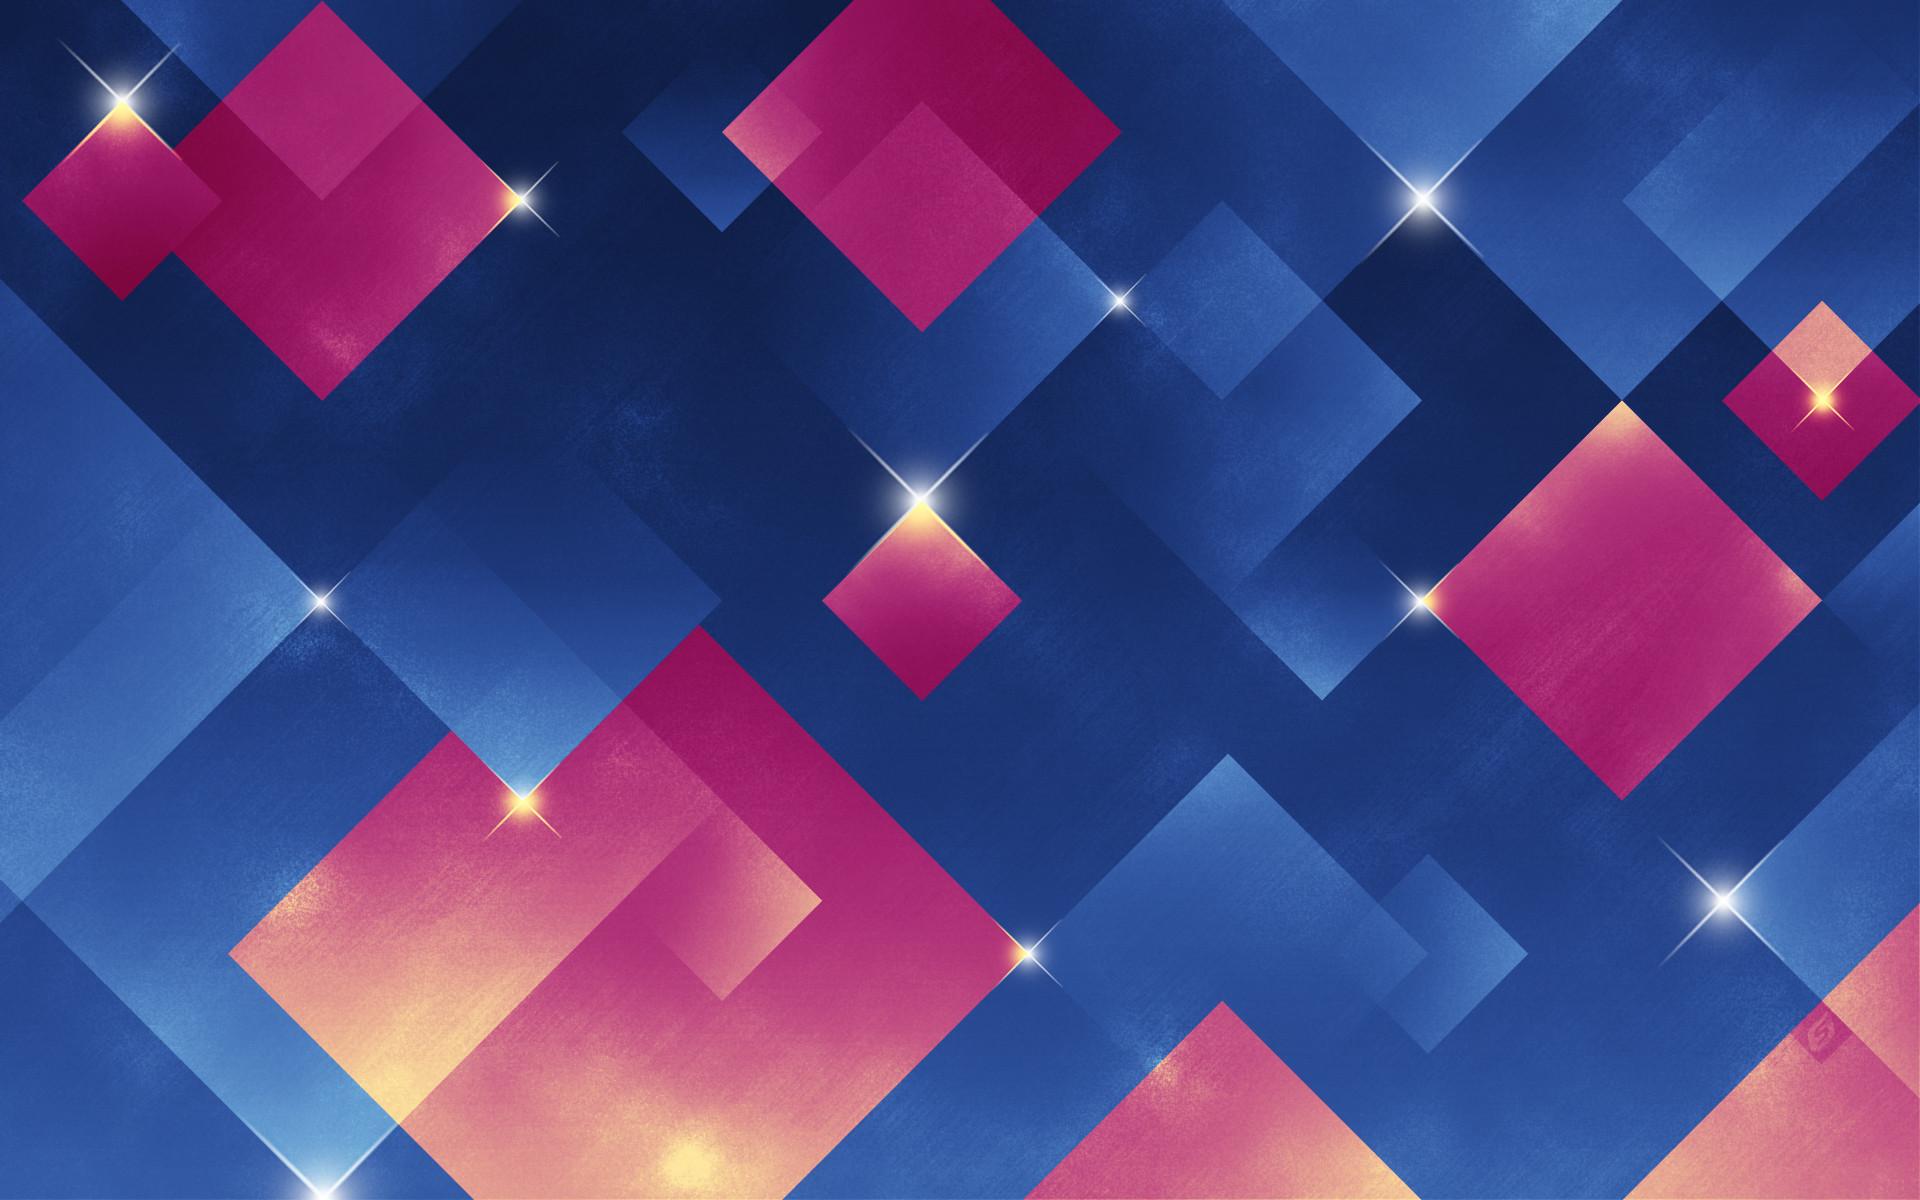 Blue and Pink Diamonds Wallpaper